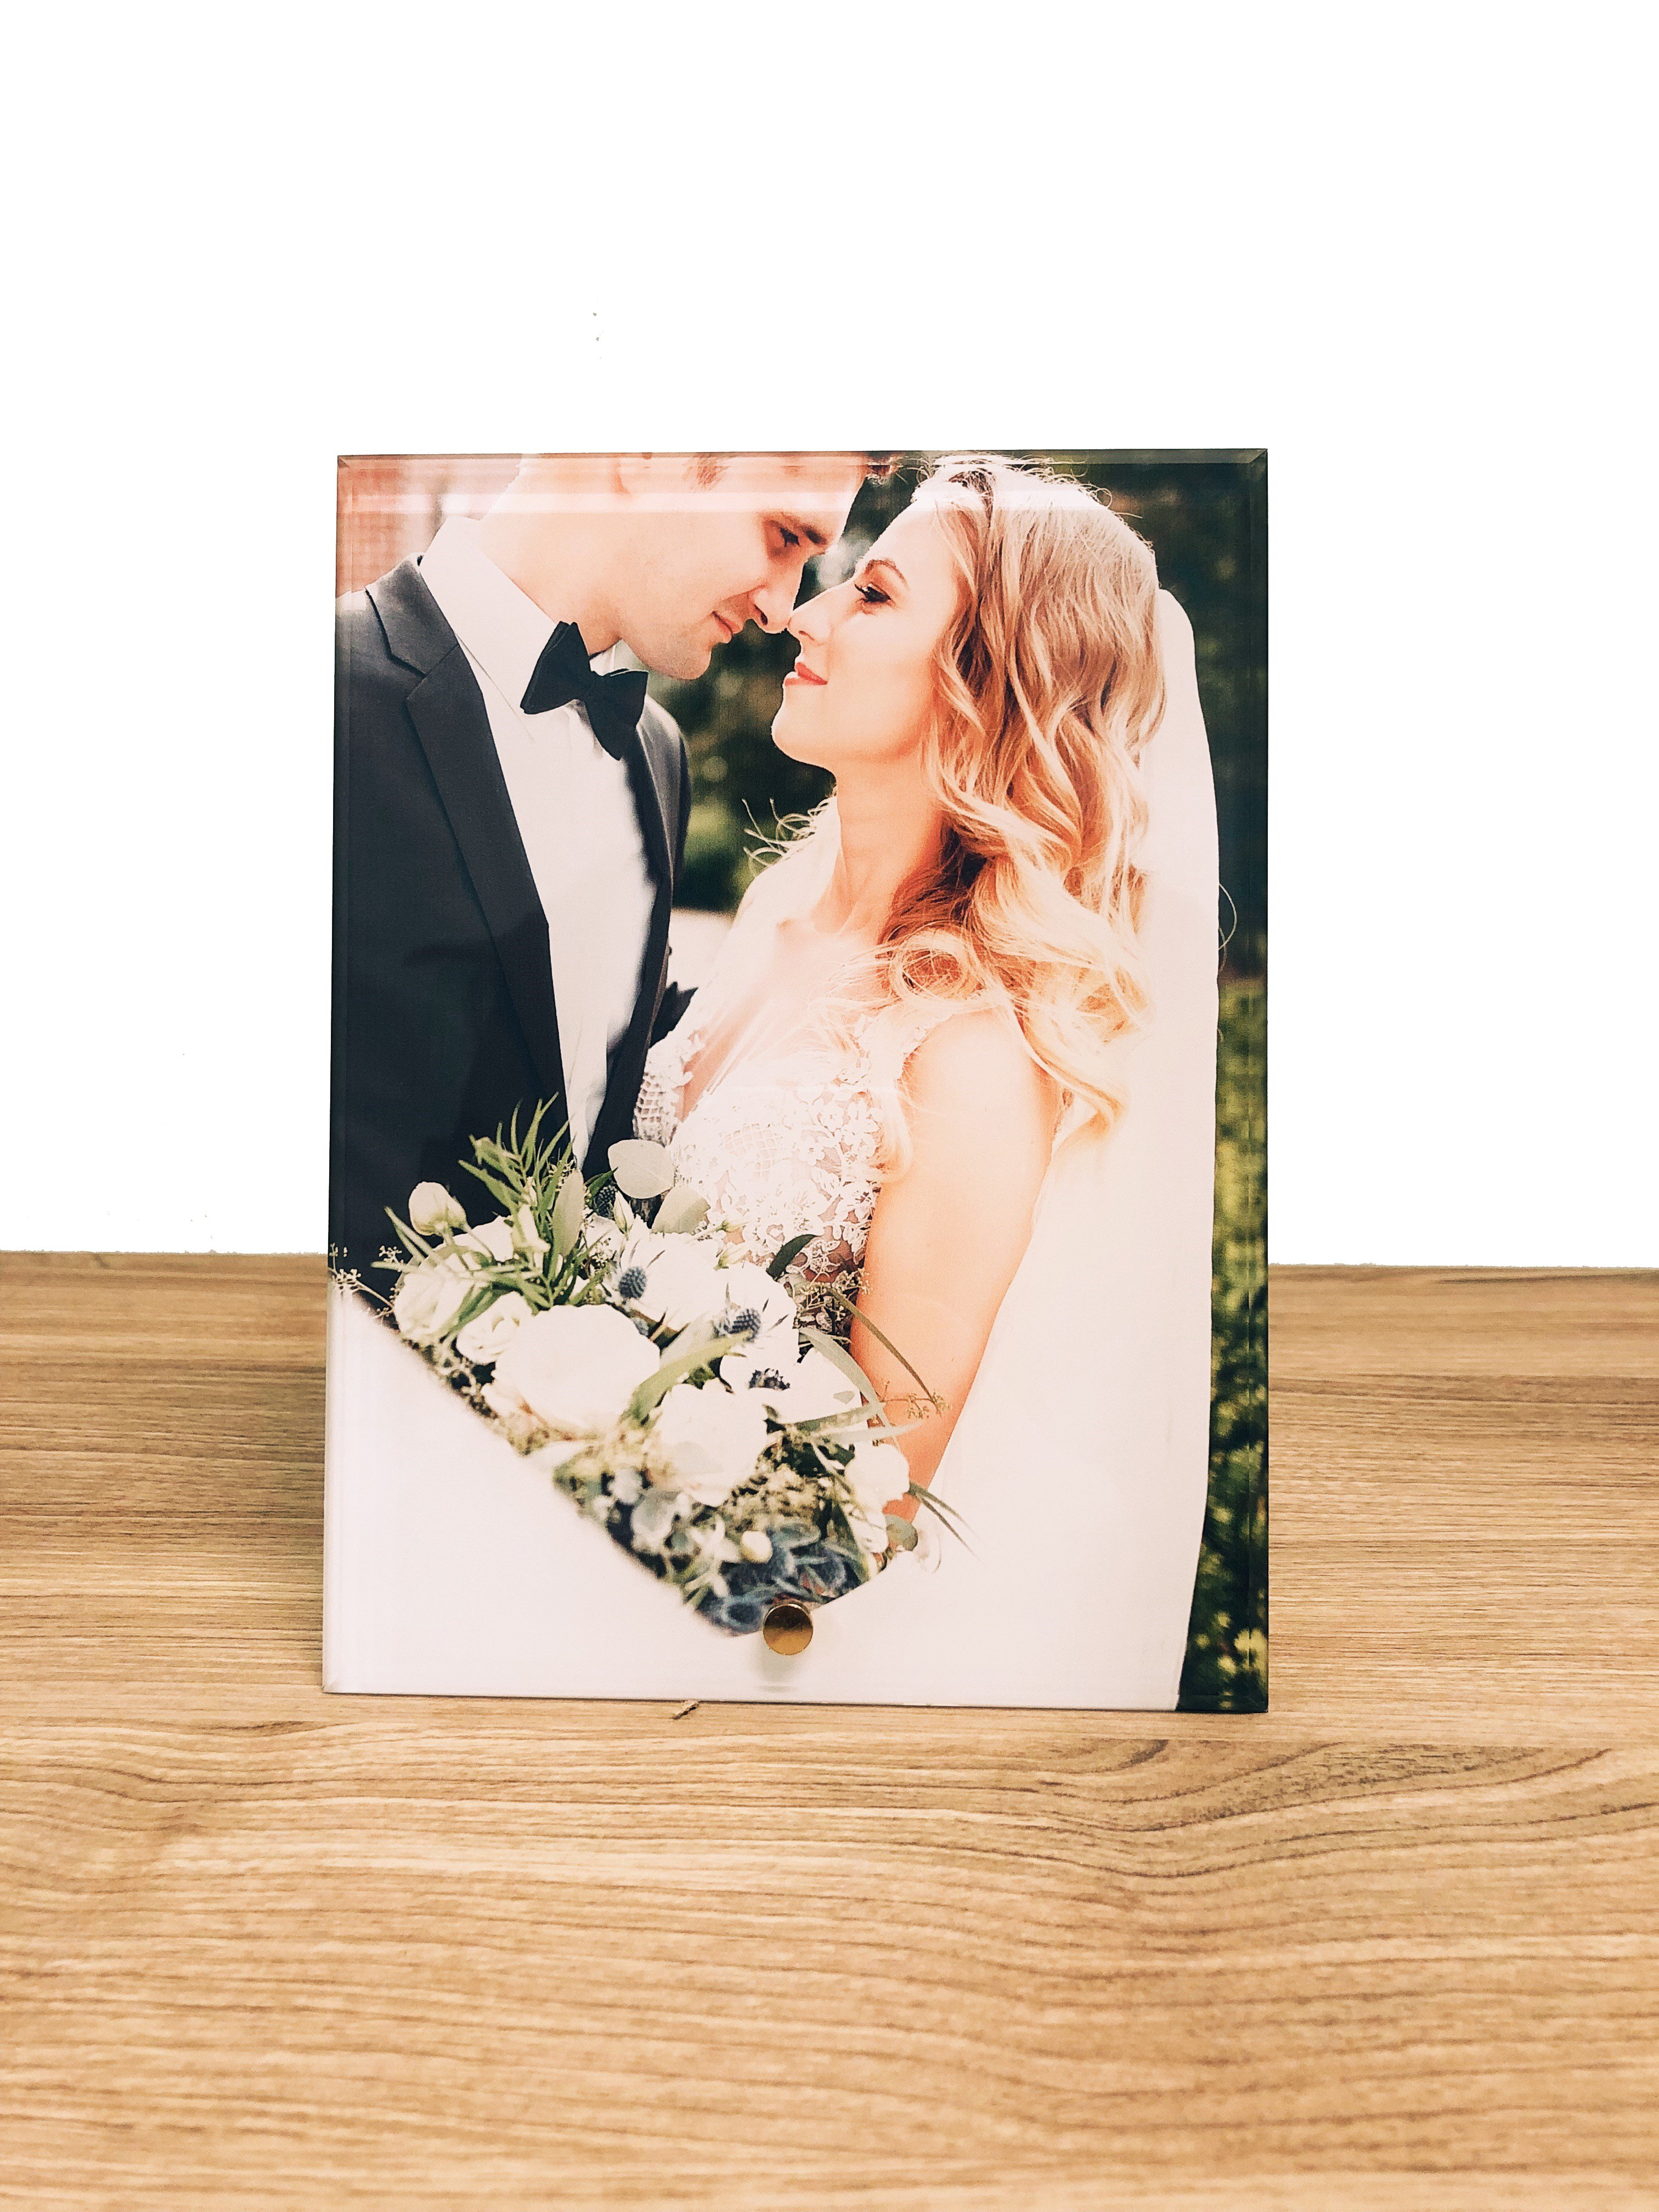 Personalized Glass Photo Print